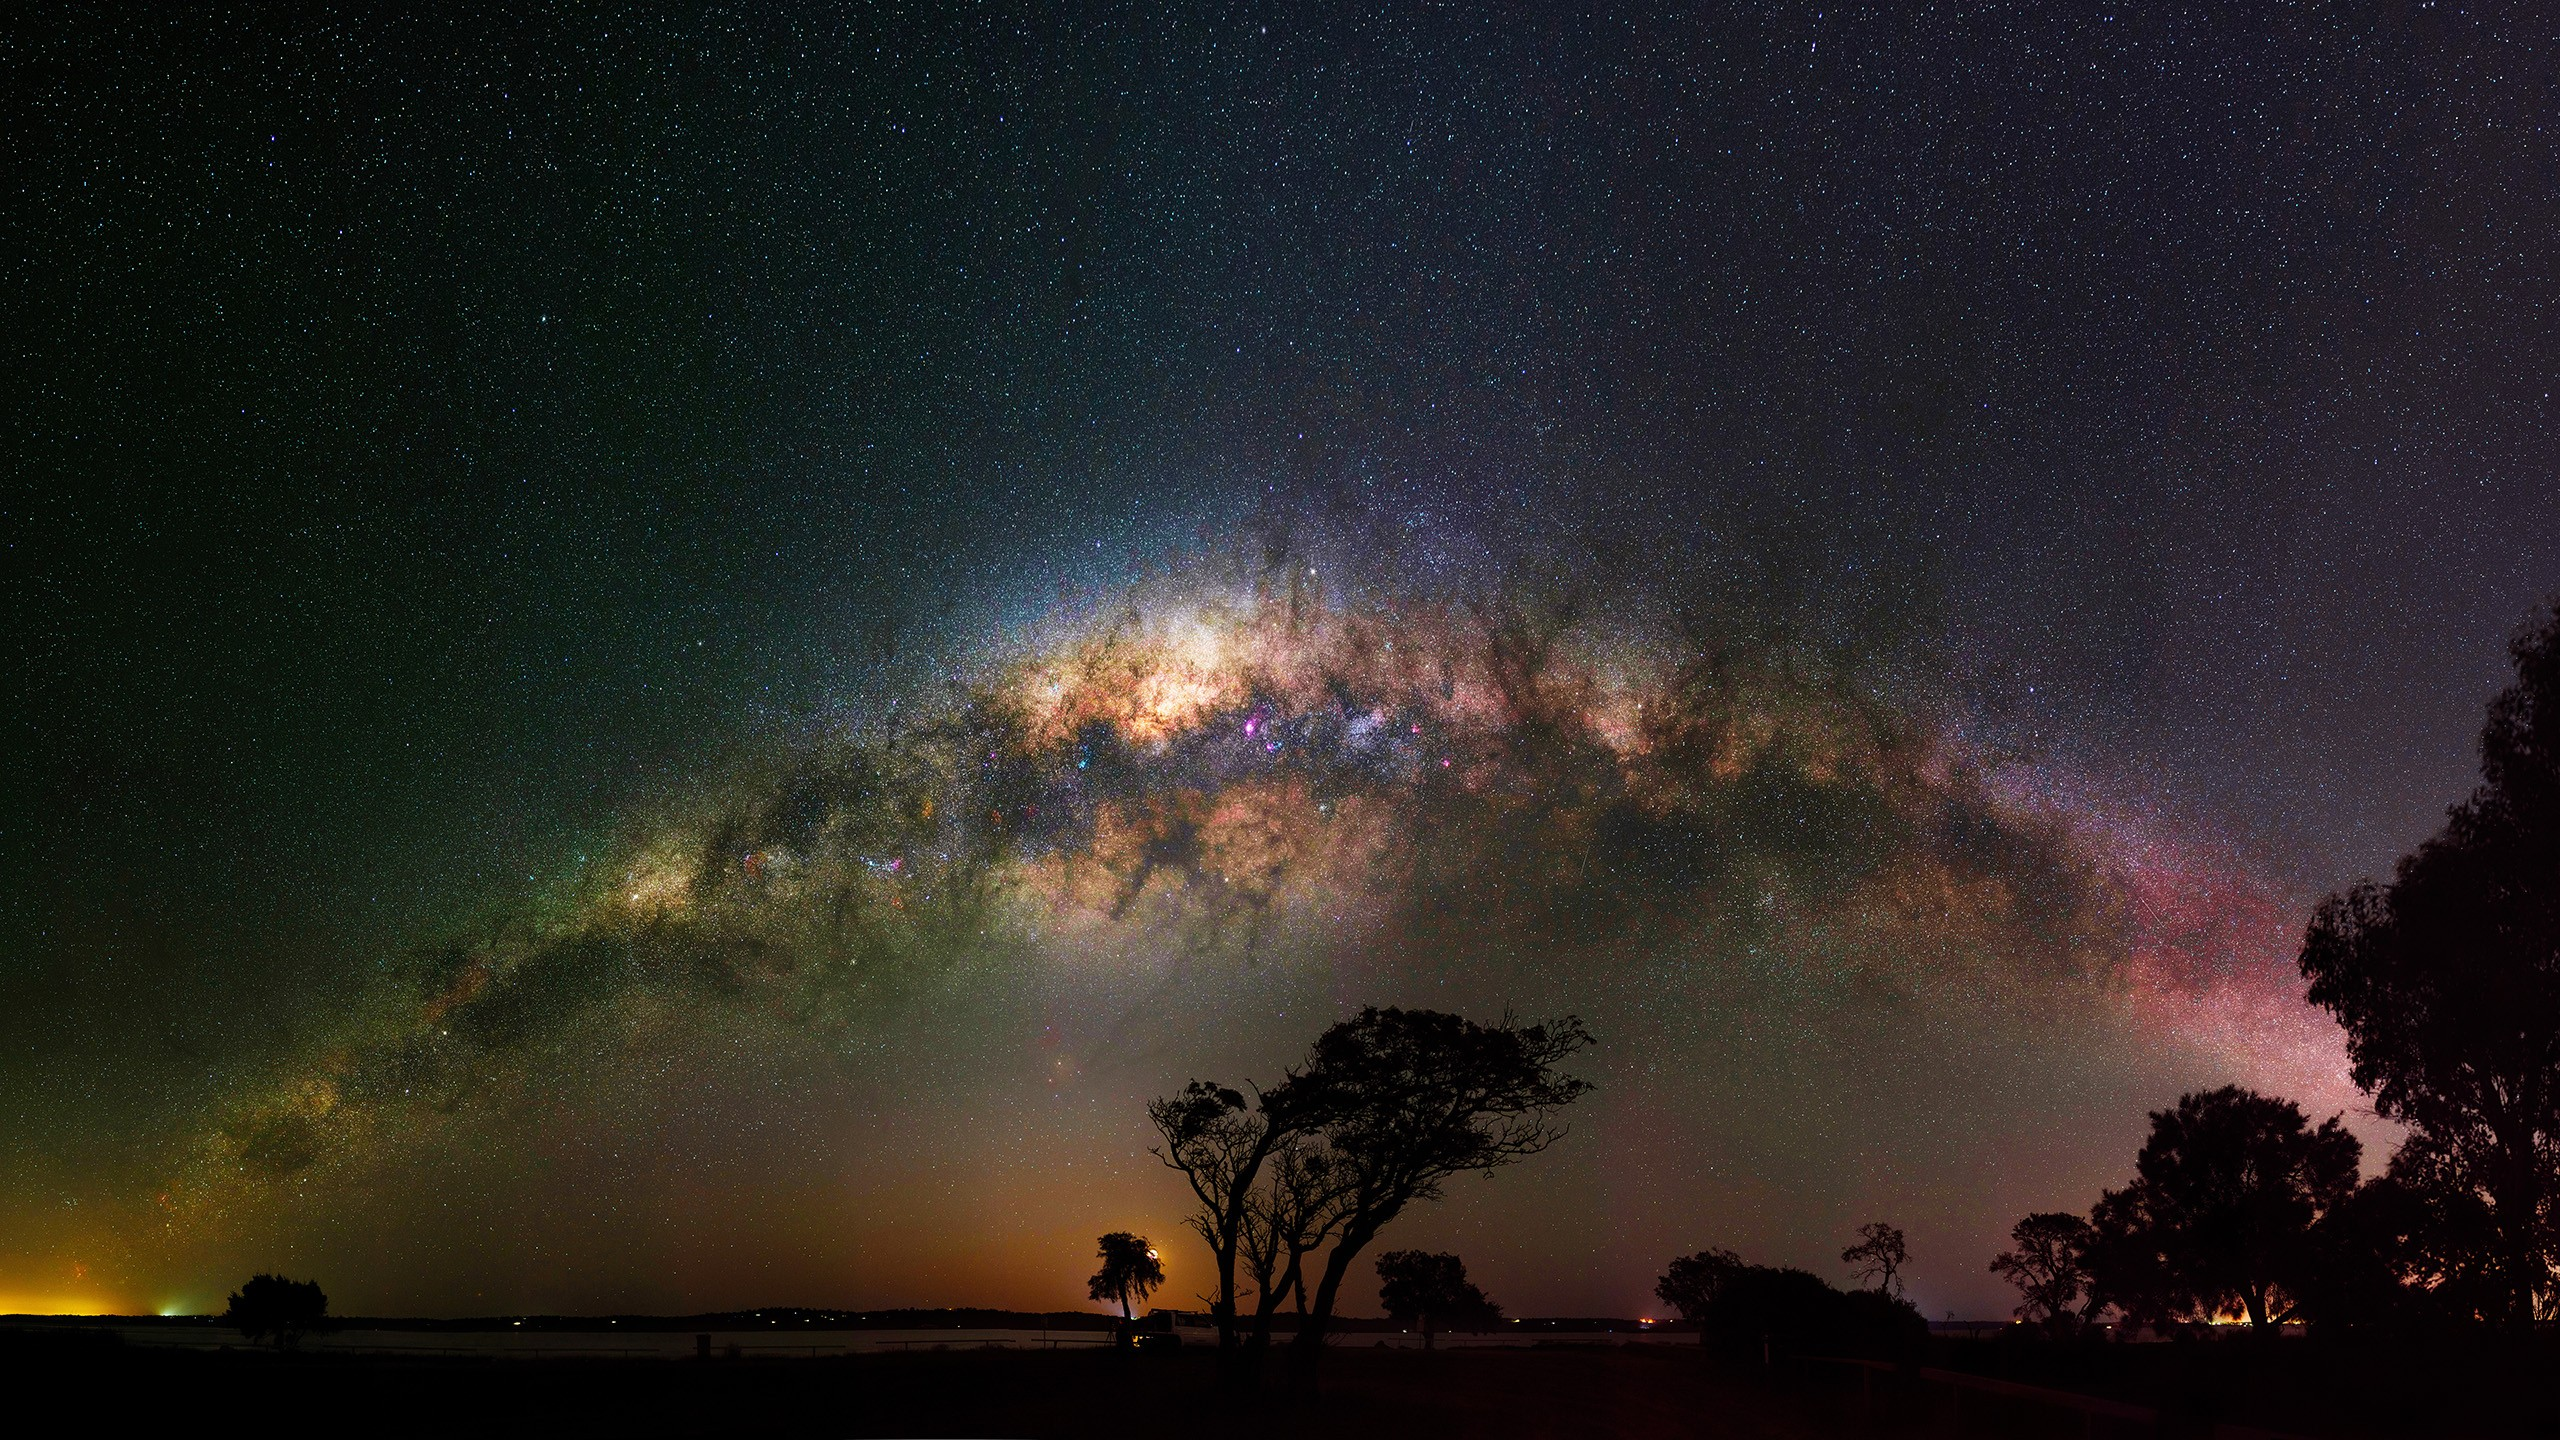 Milky Way Night Sky Starry Sky Stars Tree 2560x1440